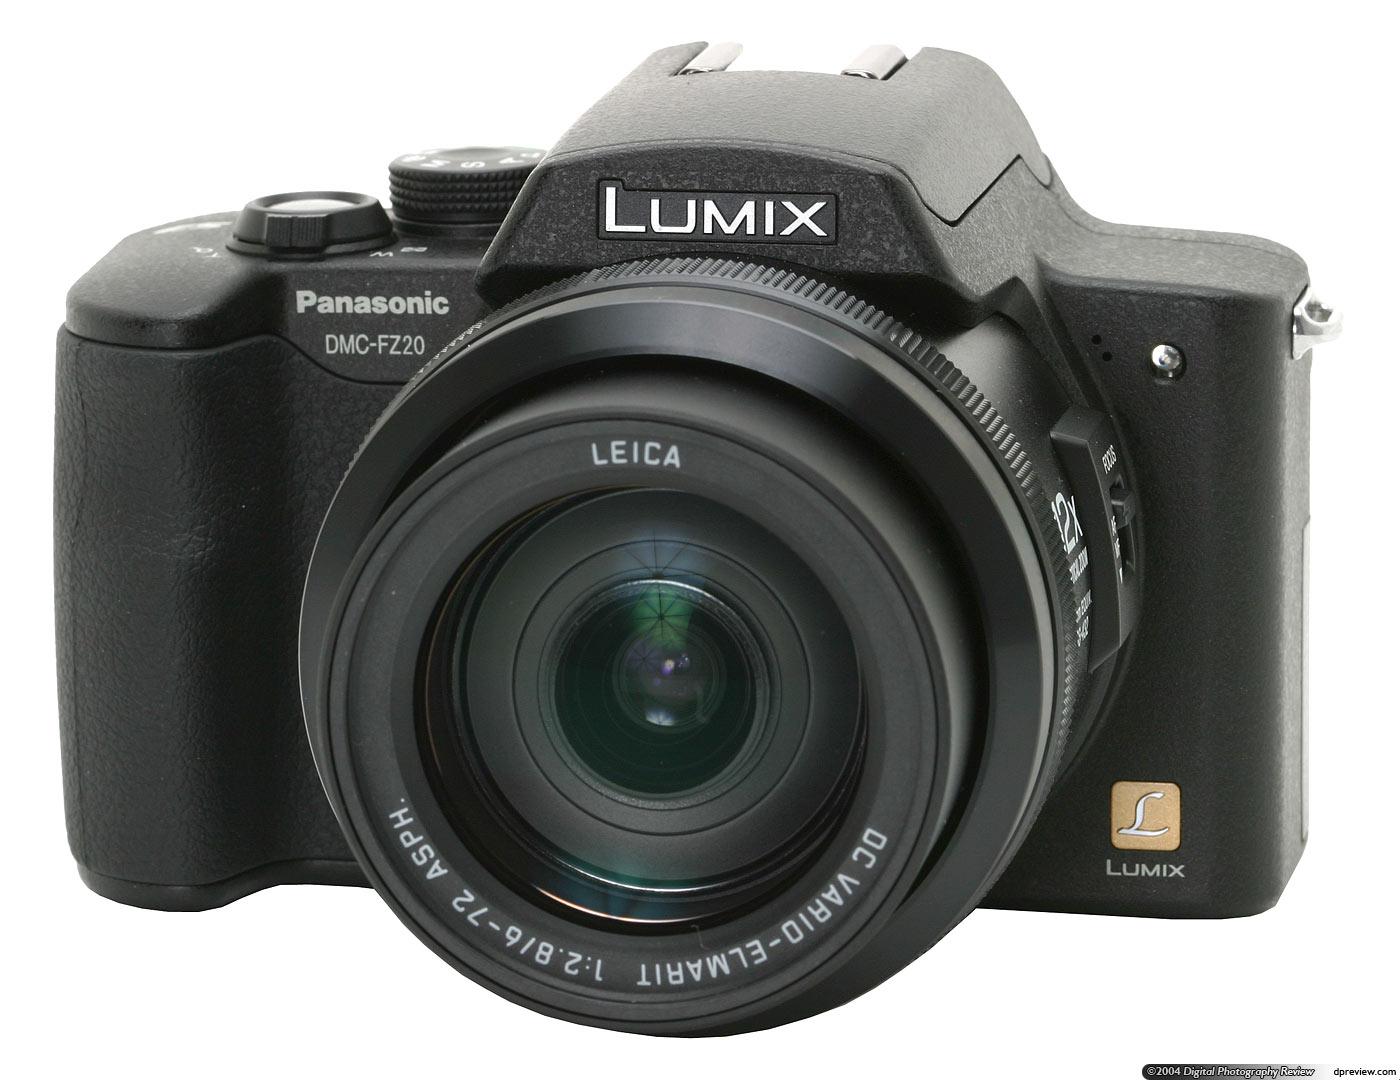 panasonic lumix dmc fz20 review digital photography review rh dpreview com panasonic lumix dmc-fz10 digital camera manual panasonic dmc-fz10 manual